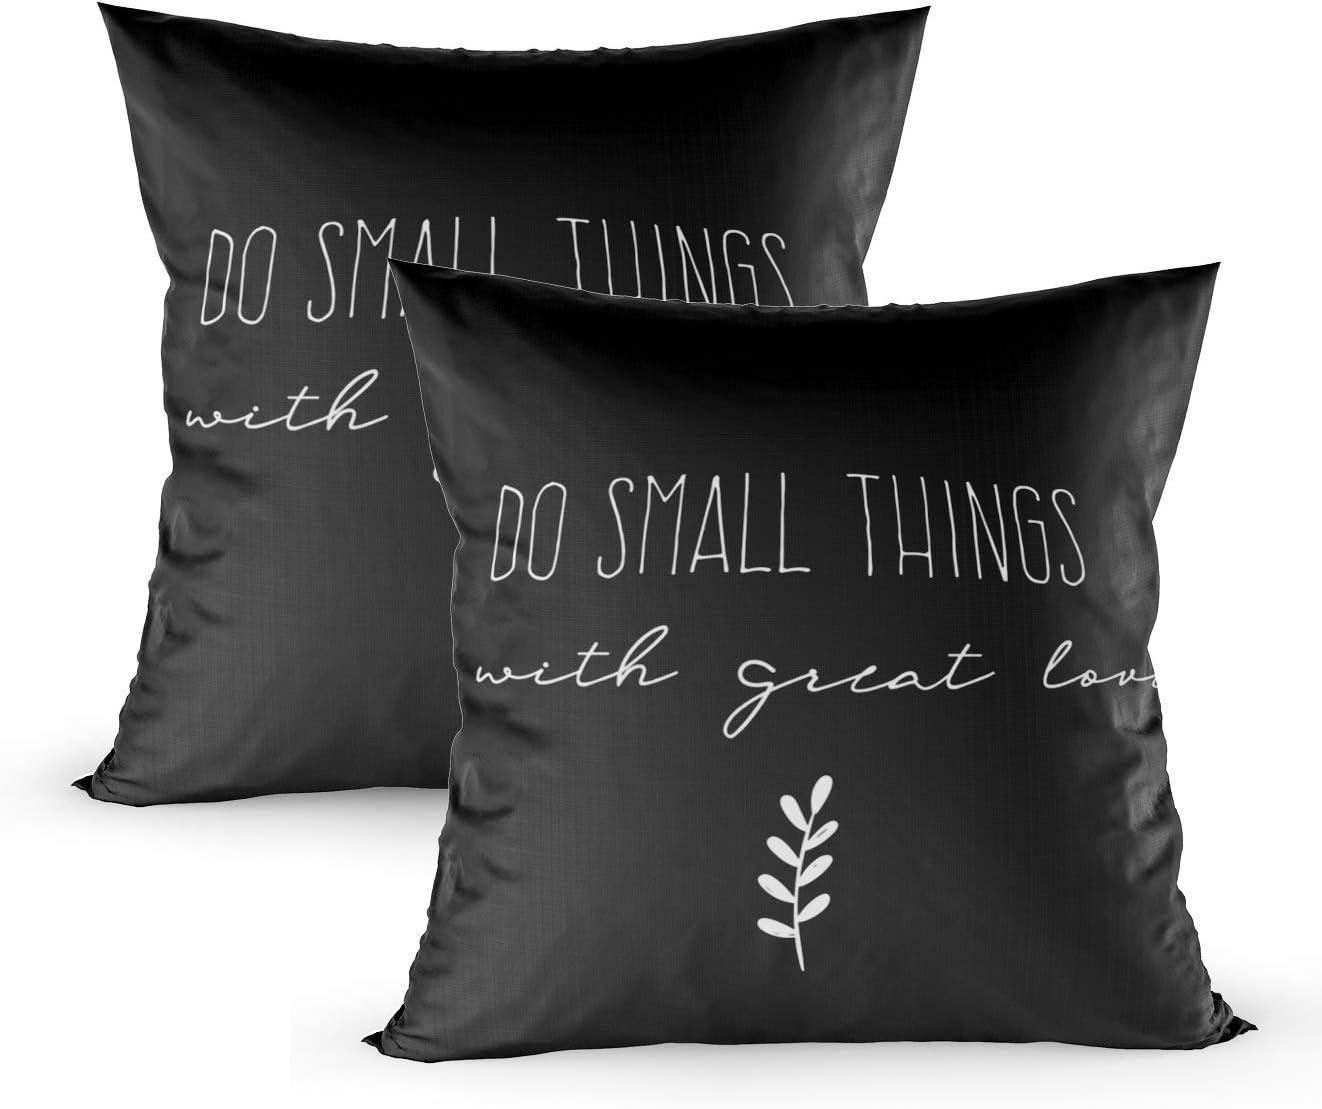 koniqiwa Throw Pillow Covers Black and